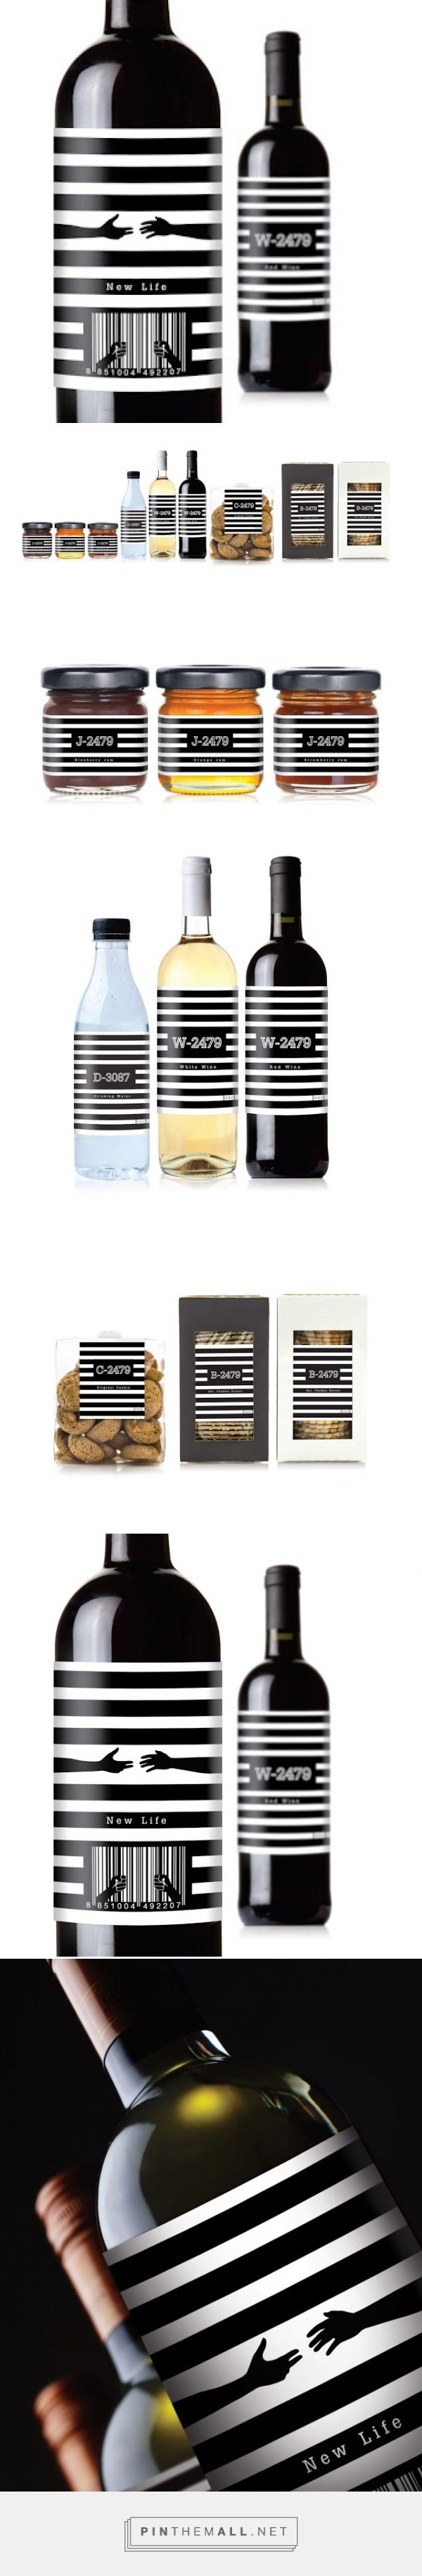 2479 Prisoner product packaging by Prompt Design